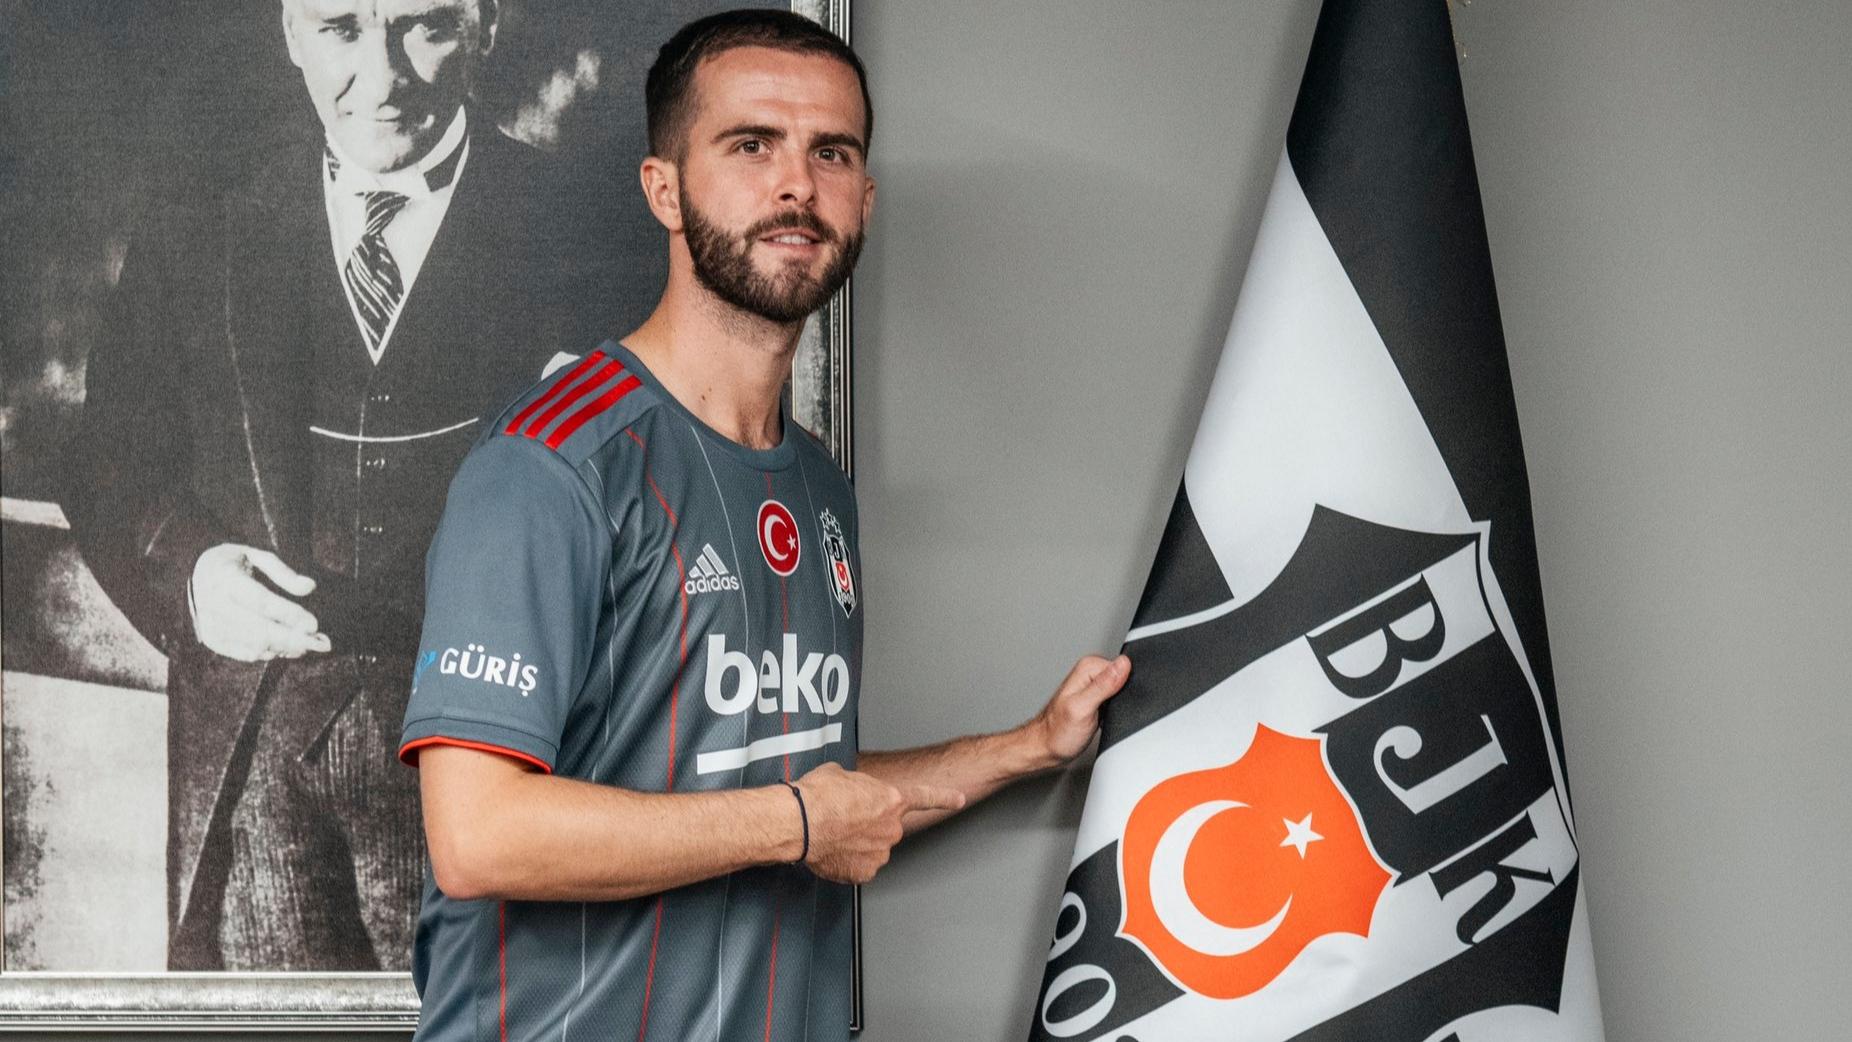 Zyrtare: Miralem Pjanic firmos me Besiktas, Barcelona çlirohet më në fund